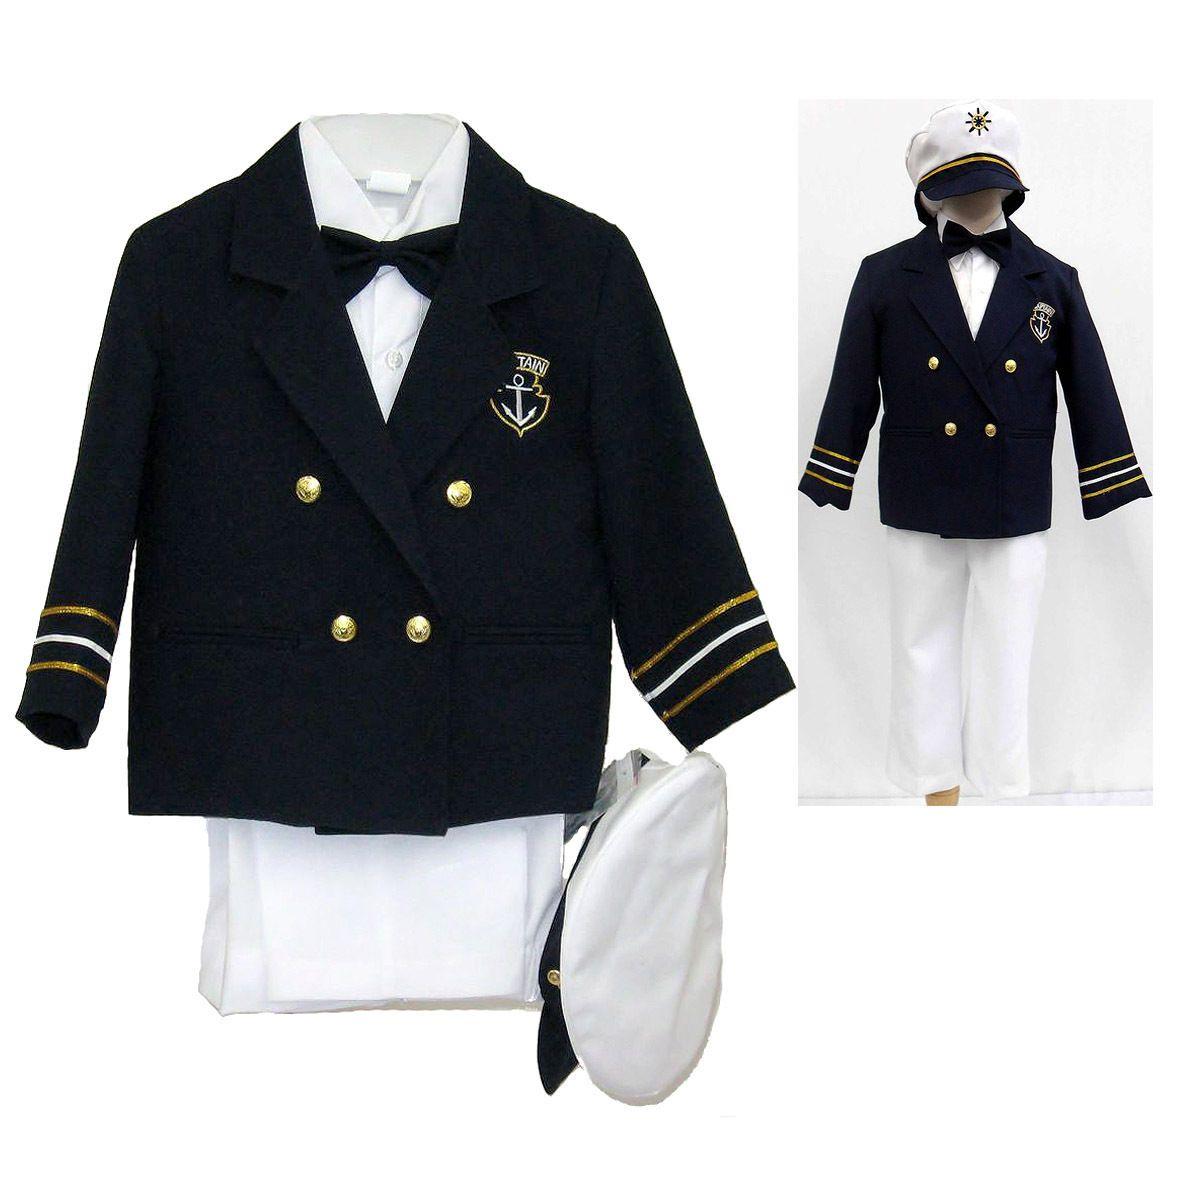 Navy baby boy toddler costume nautical captain sailor suit hat white